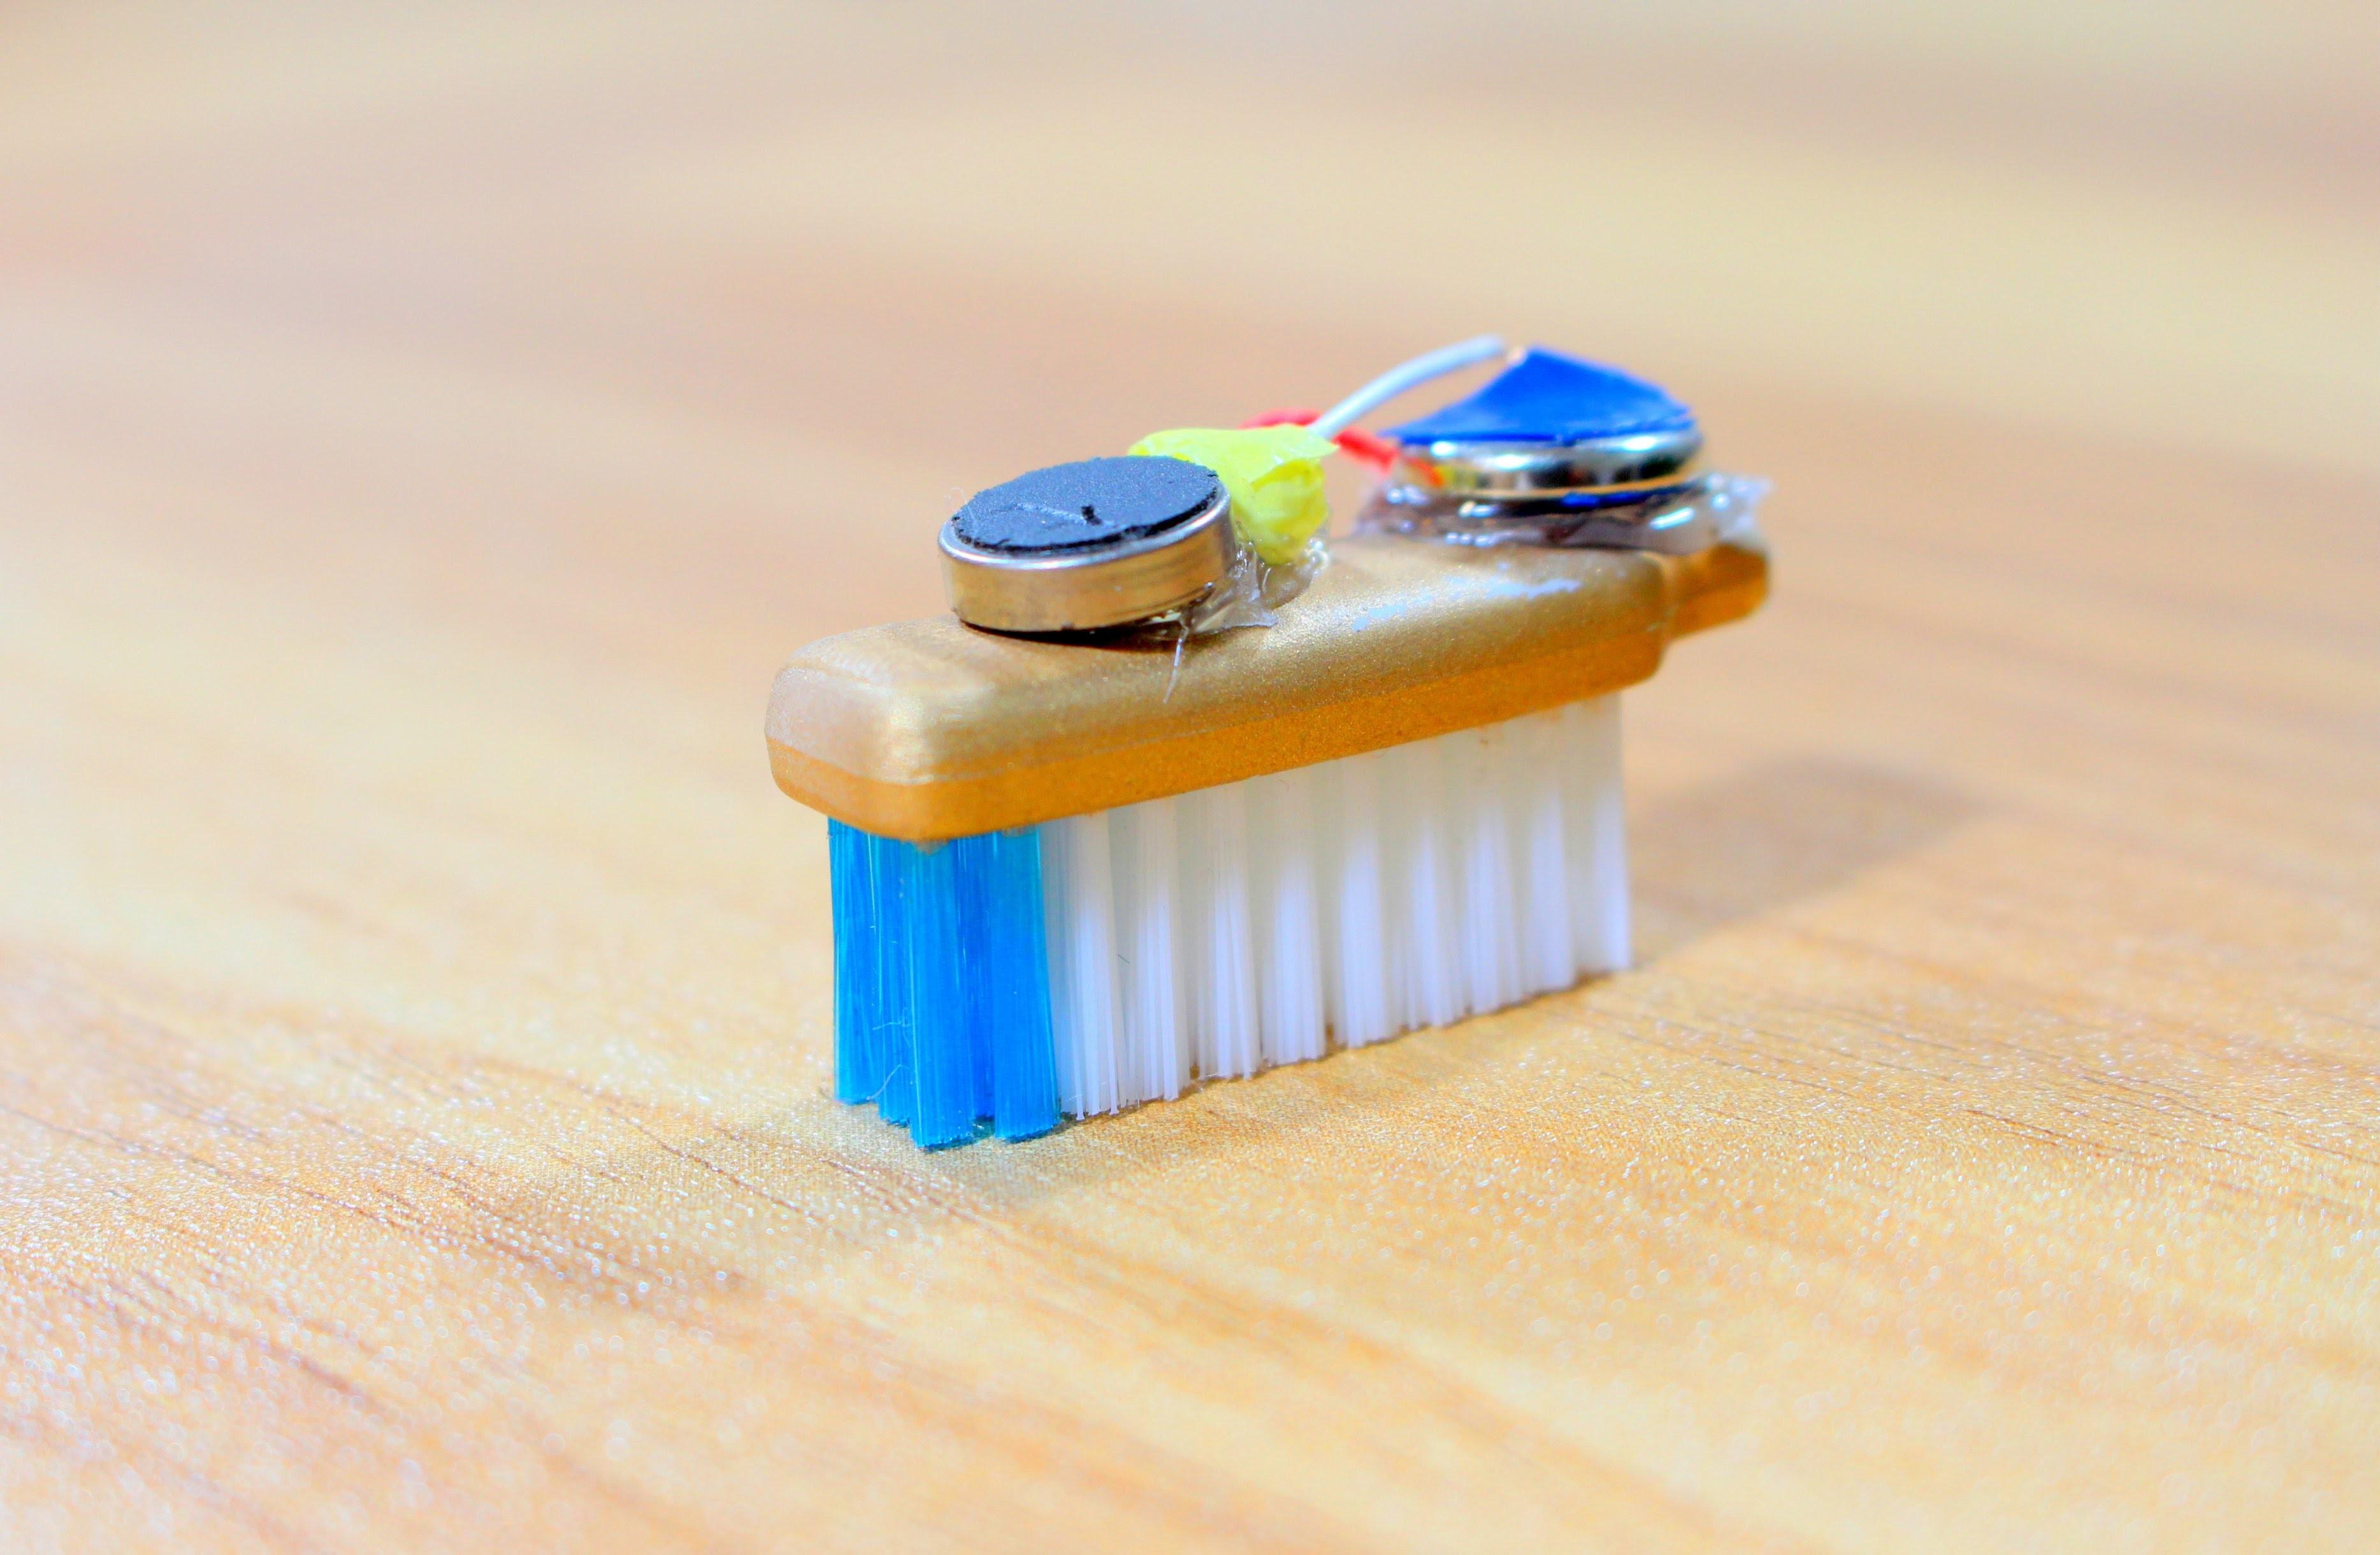 How to Make a Mini BristleBot